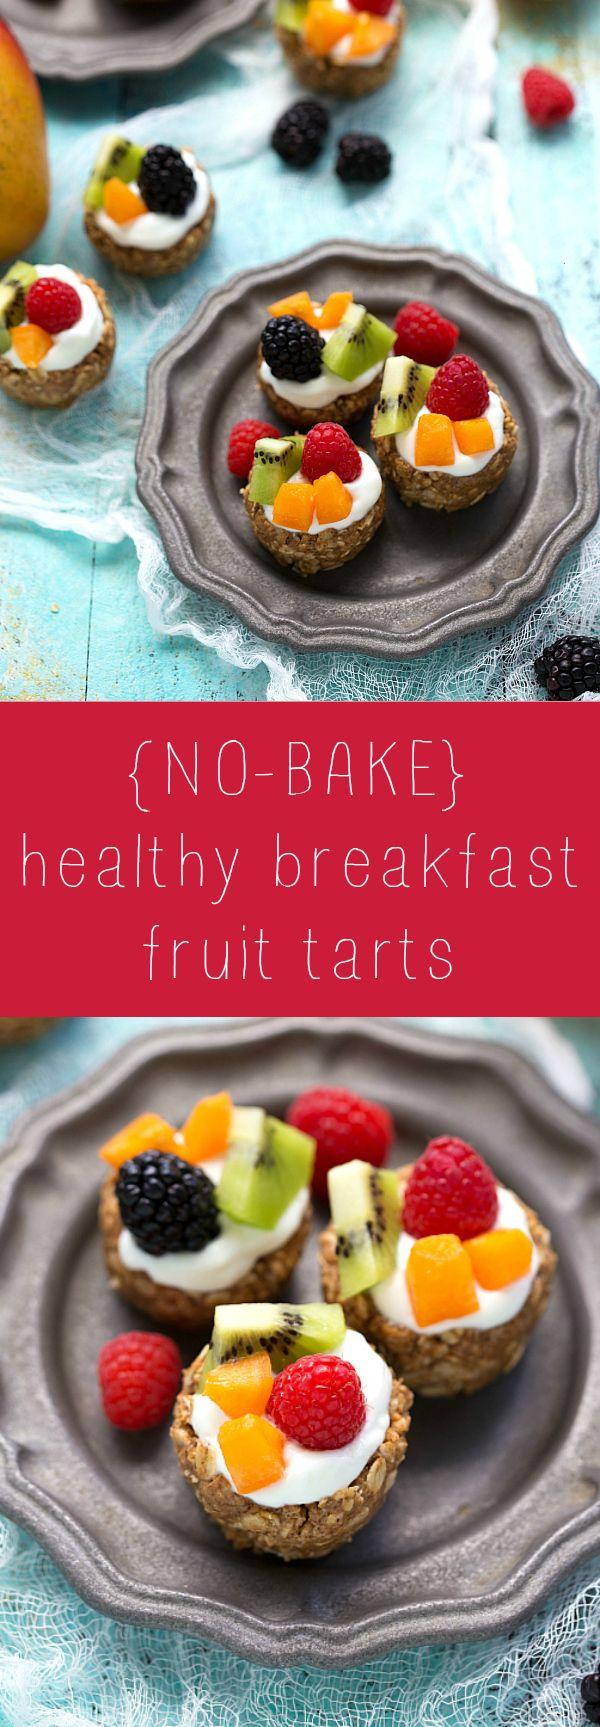 easy no bake healthy breakfast fruit tarts tathiessen recipes